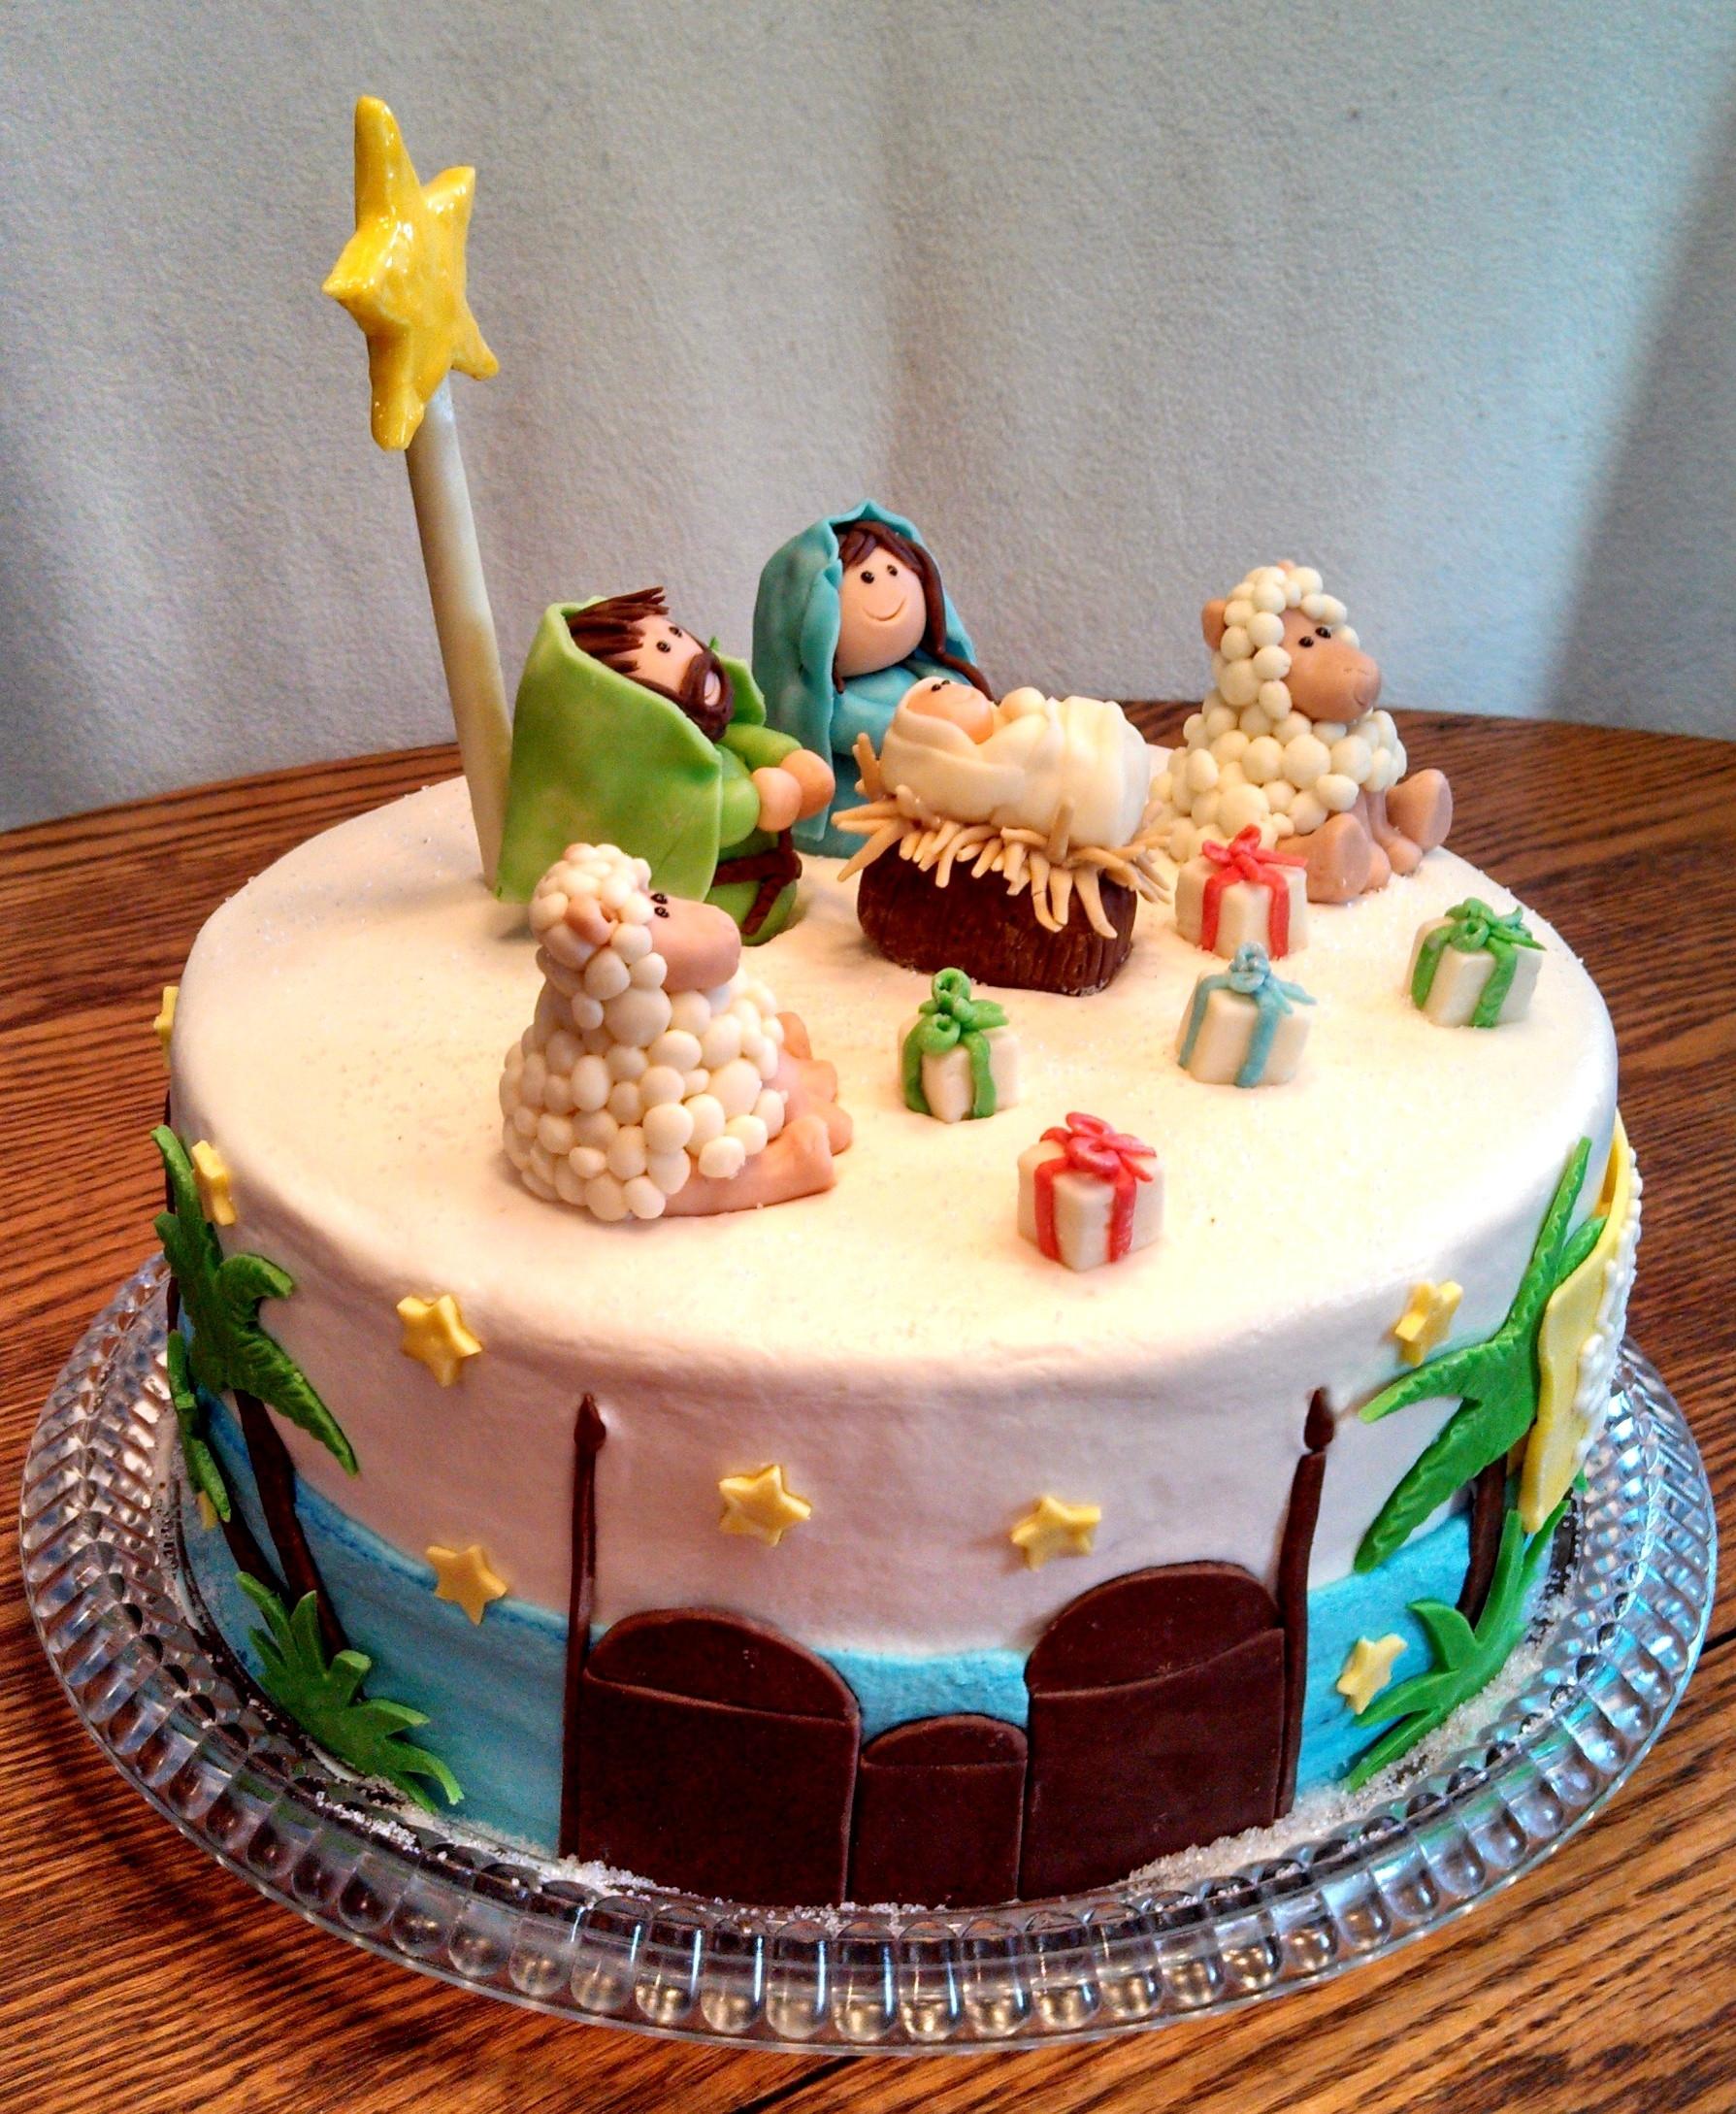 Best ideas about Happy Birthday Jesus Cake . Save or Pin Happy Birthday Jesus CakeCentral Now.